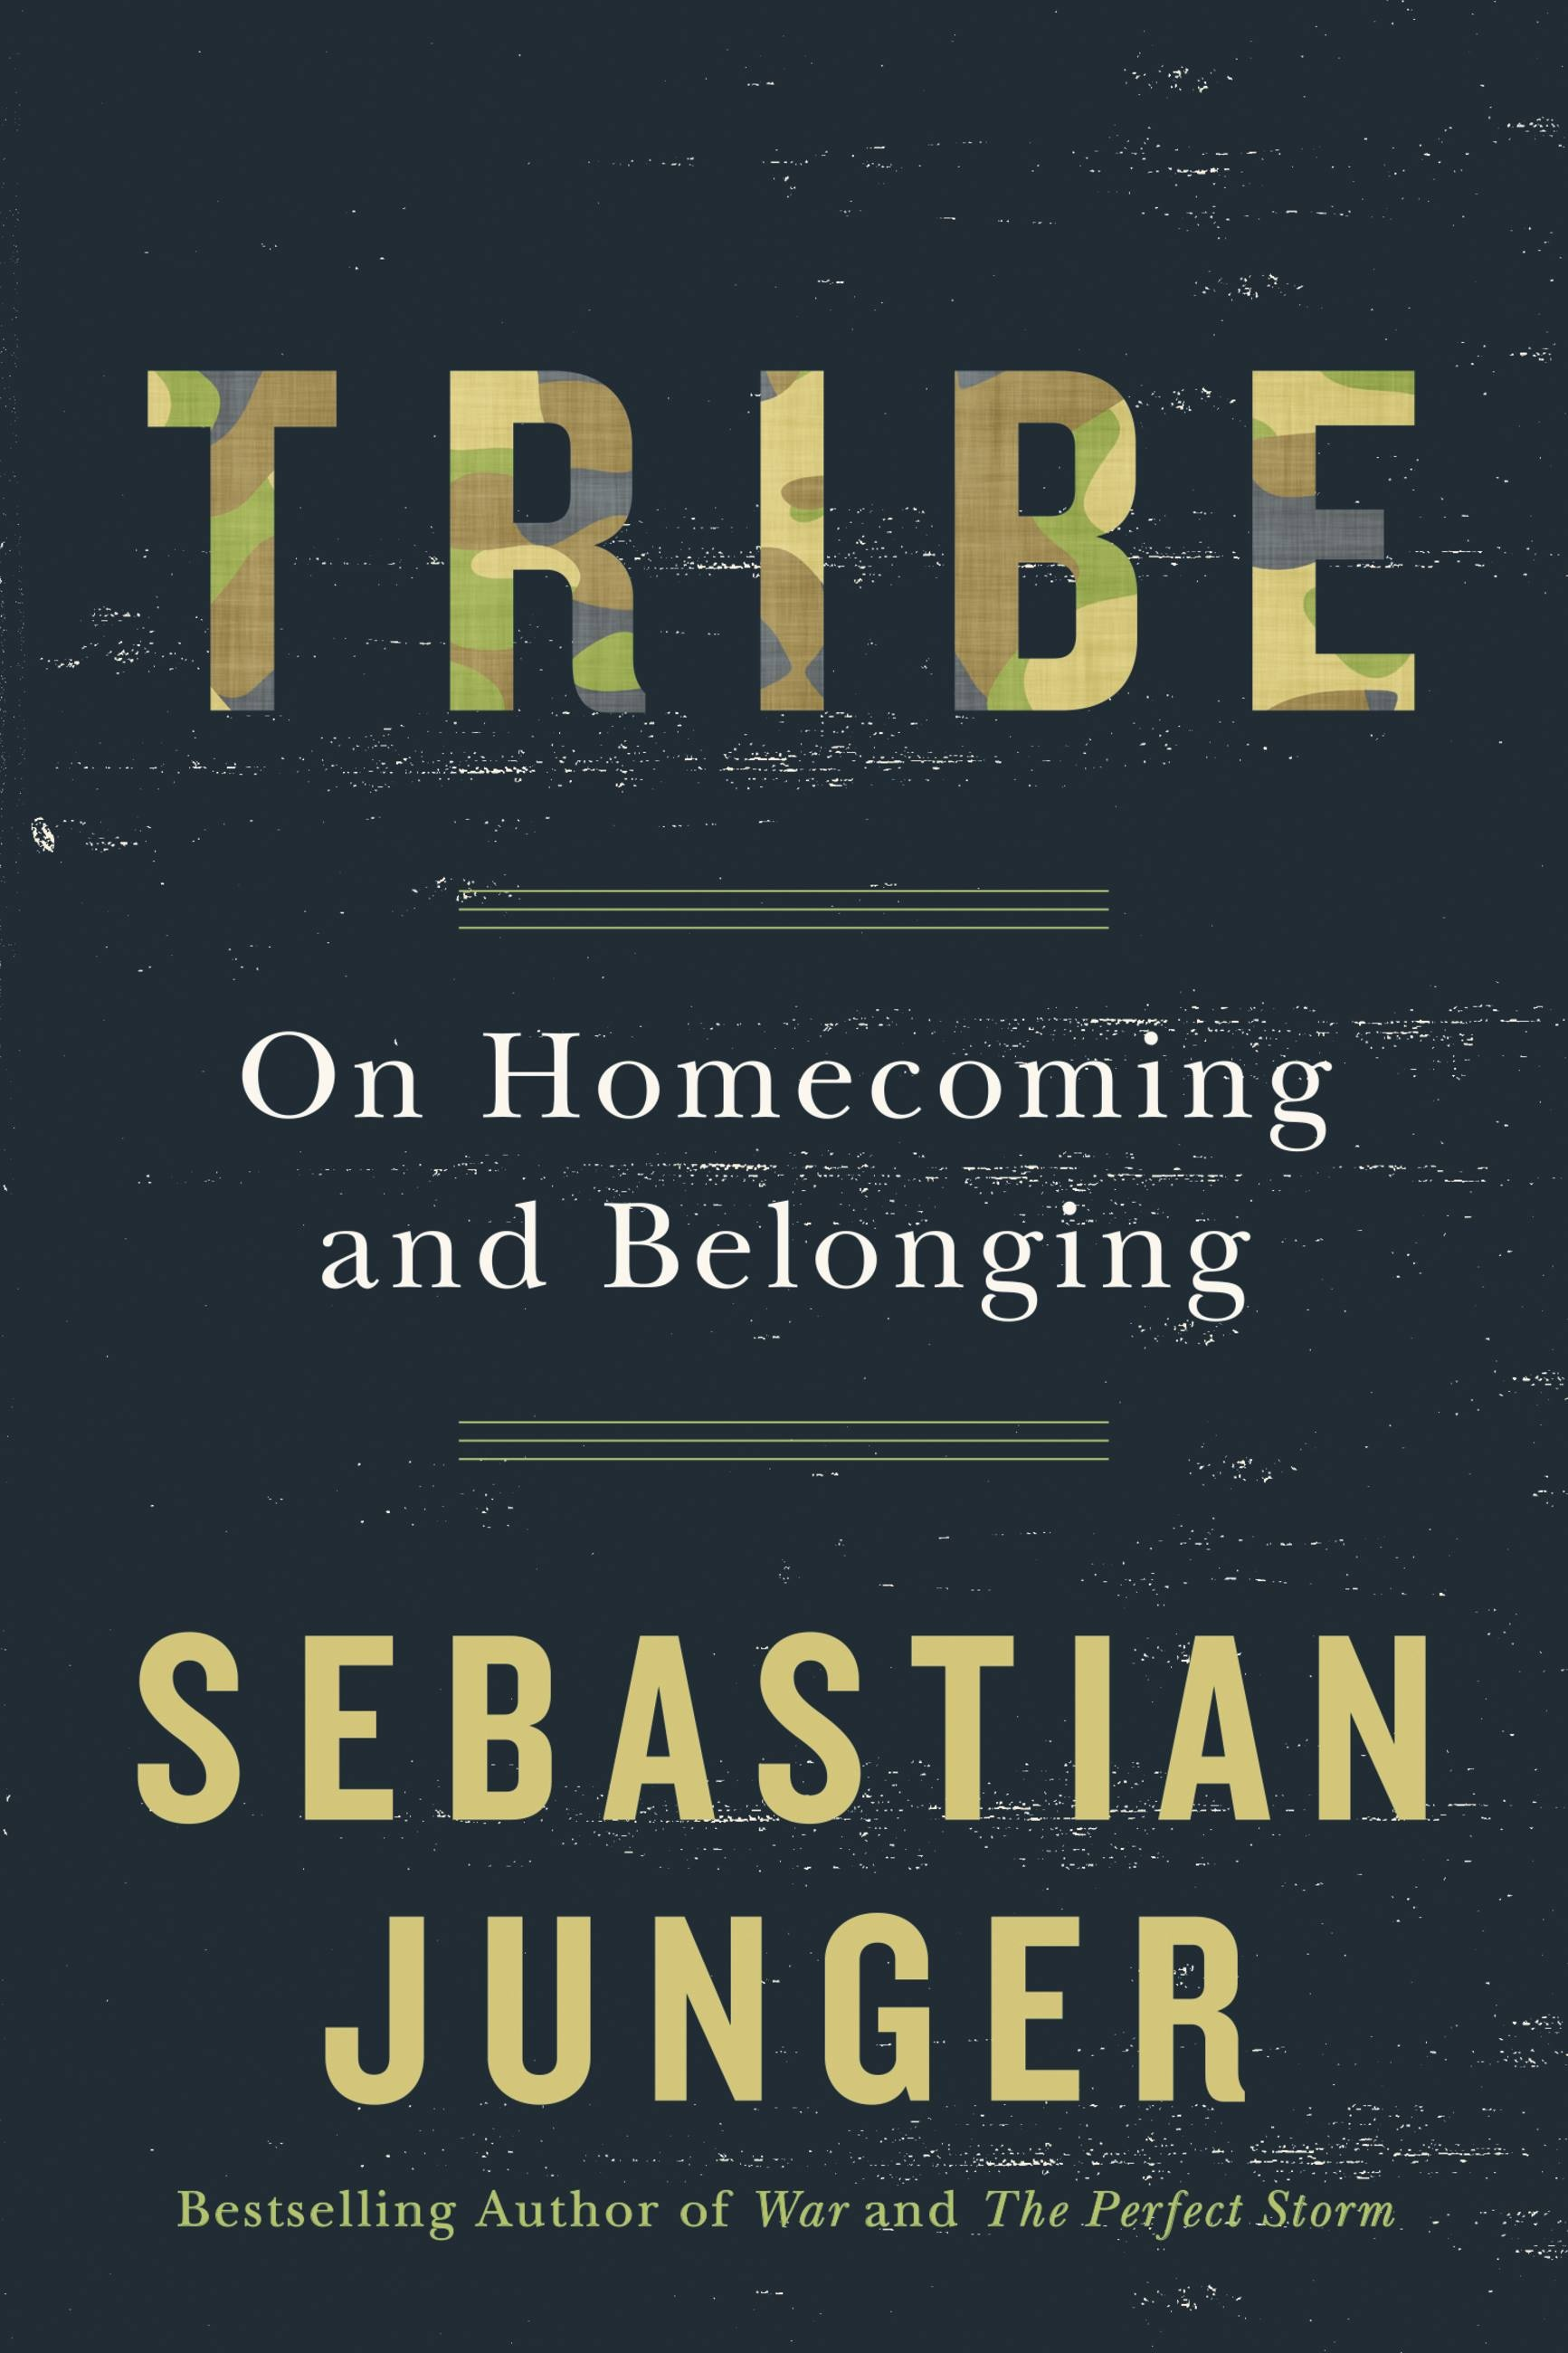 High School Argumentative Essay Topics  Politics And The English Language Essay also Essay Paper Help Tribe By Sebastian Junger  Twelve English Essay Books